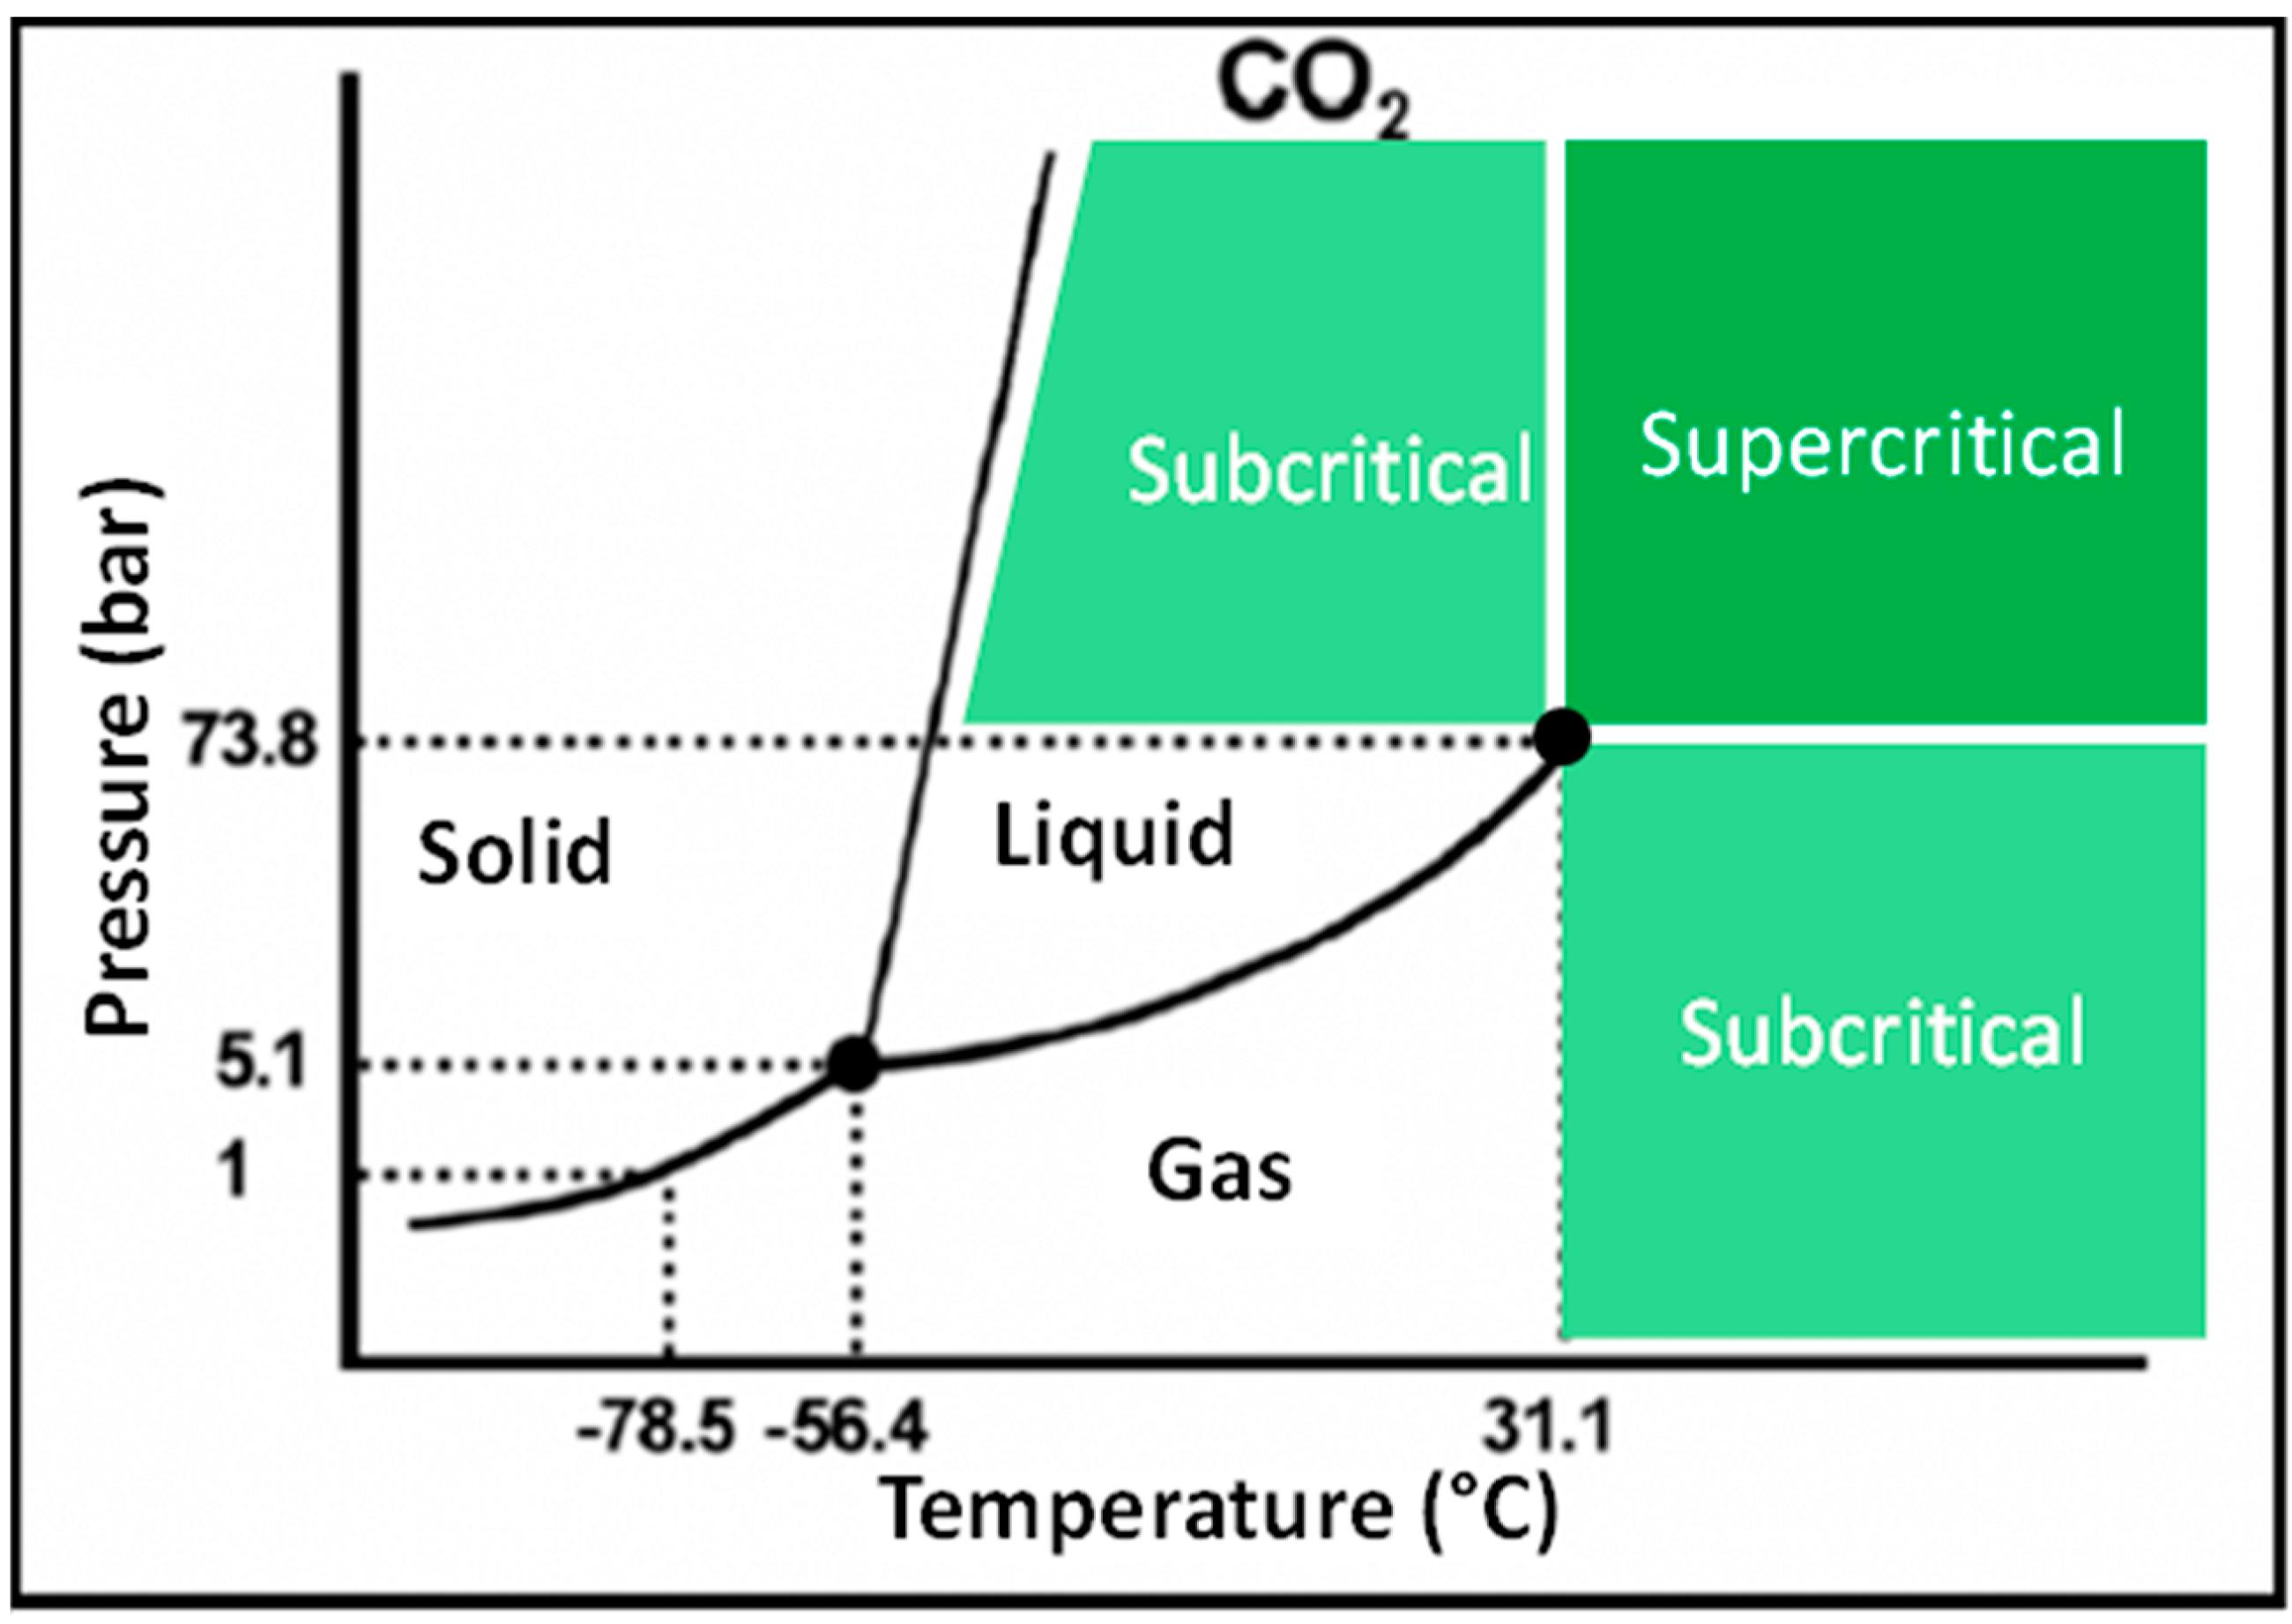 medium resolution of supercritical phase diagram of co2 printable diagram